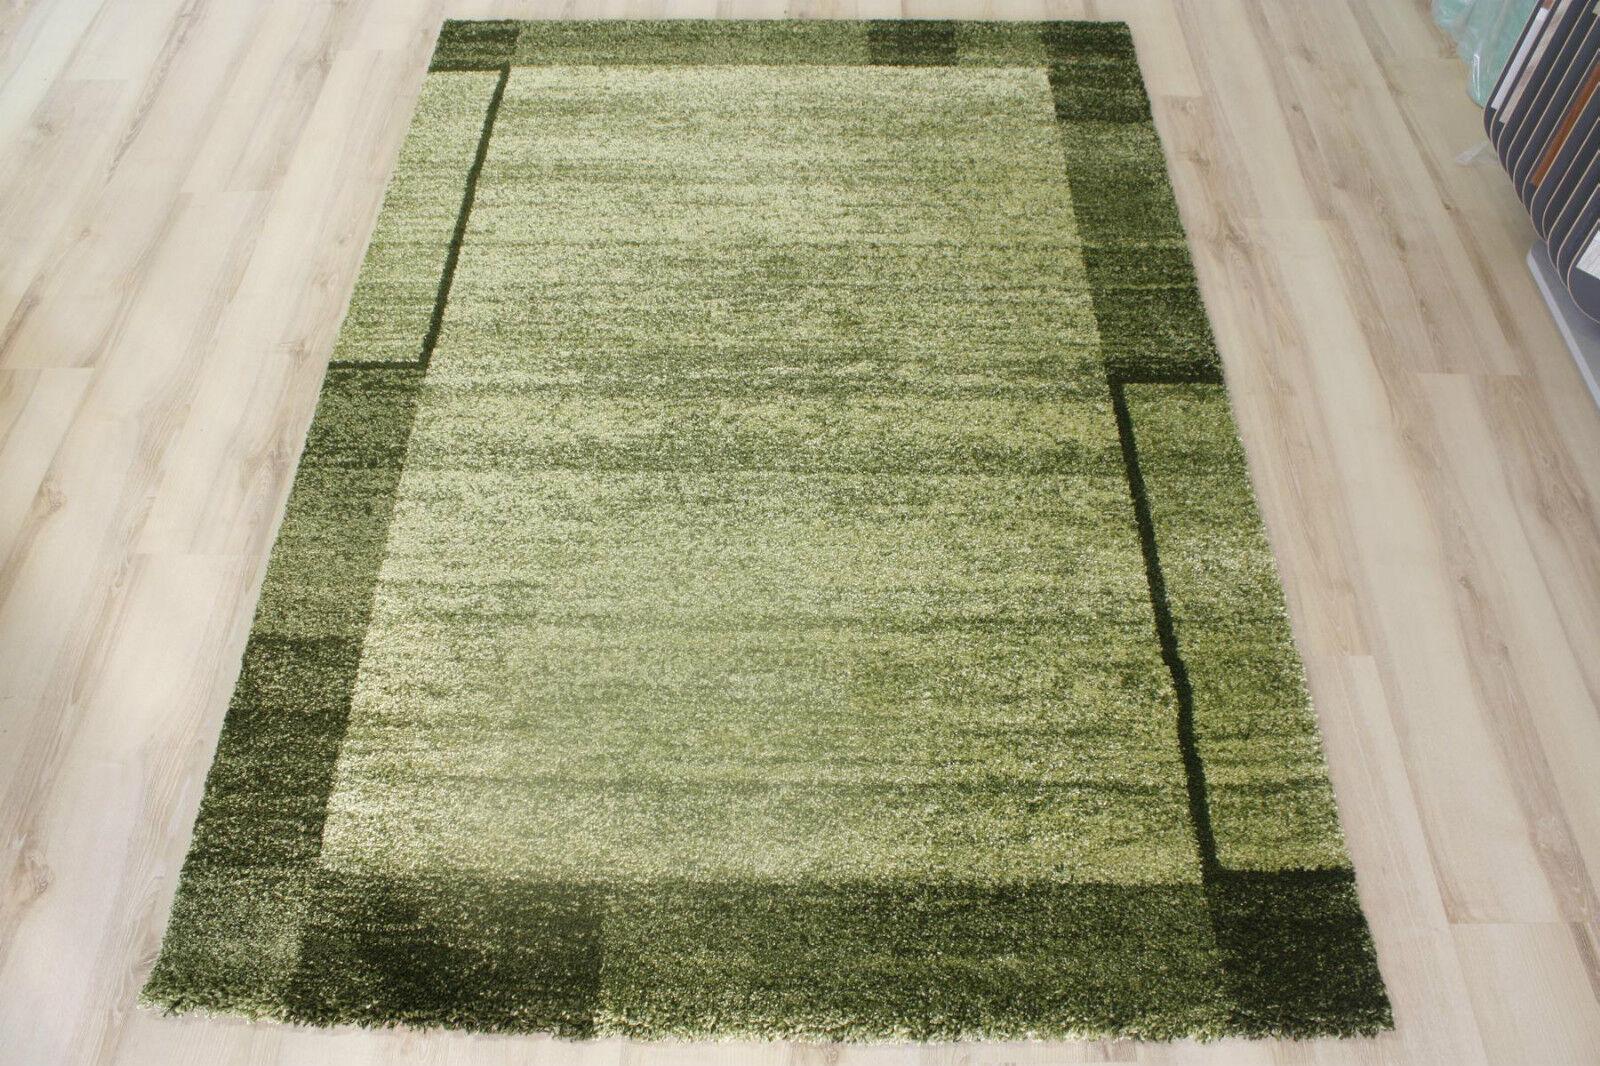 ASTRA samoa tapis 6870 152 030 vert 140x200cm NEUF